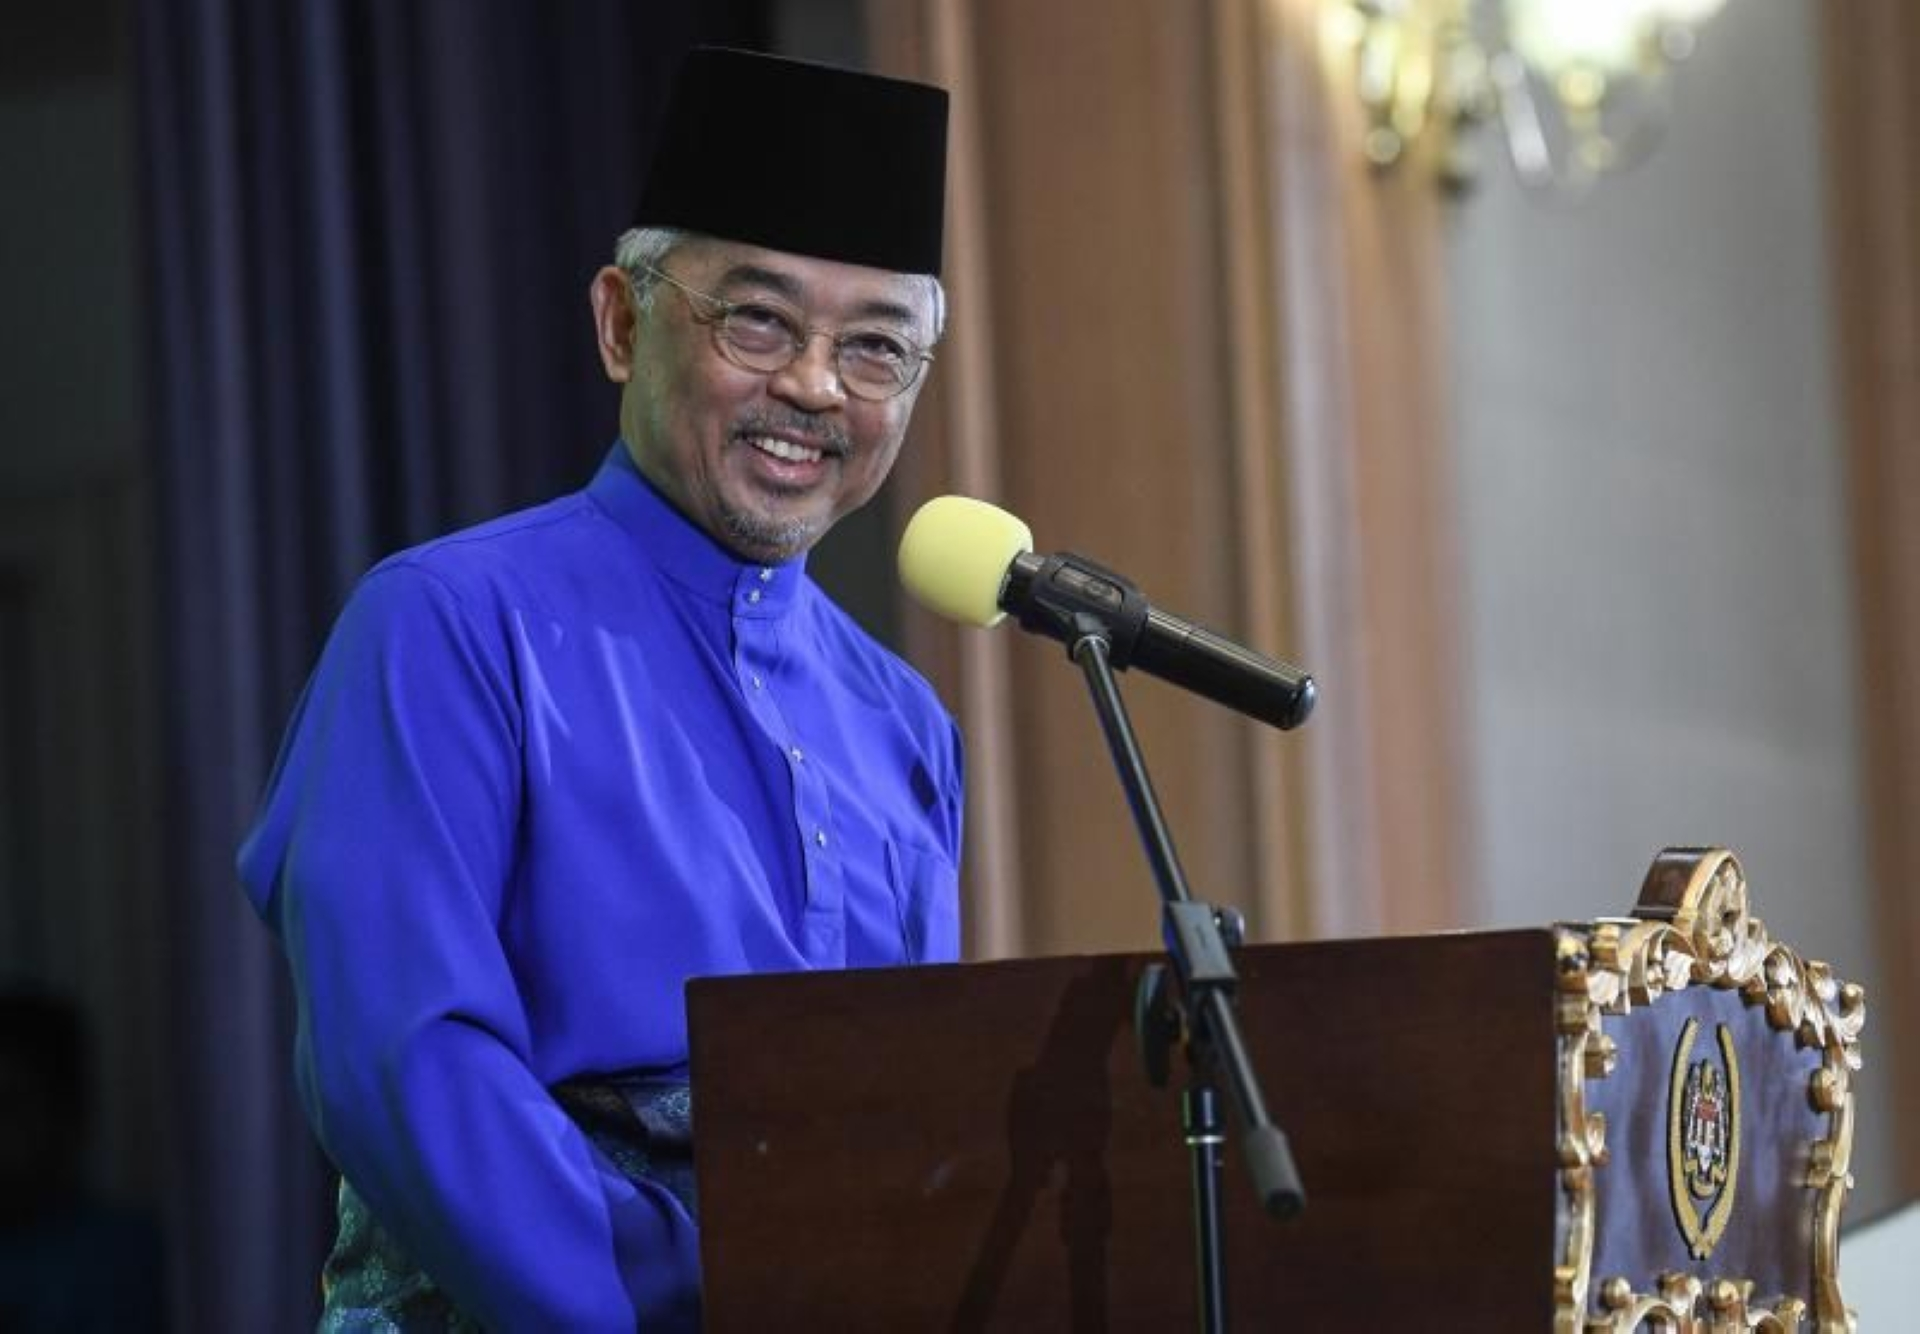 ensayo Integración Con rapidez  King congratulates Malaysian scientist Dr Serena | The Star Online